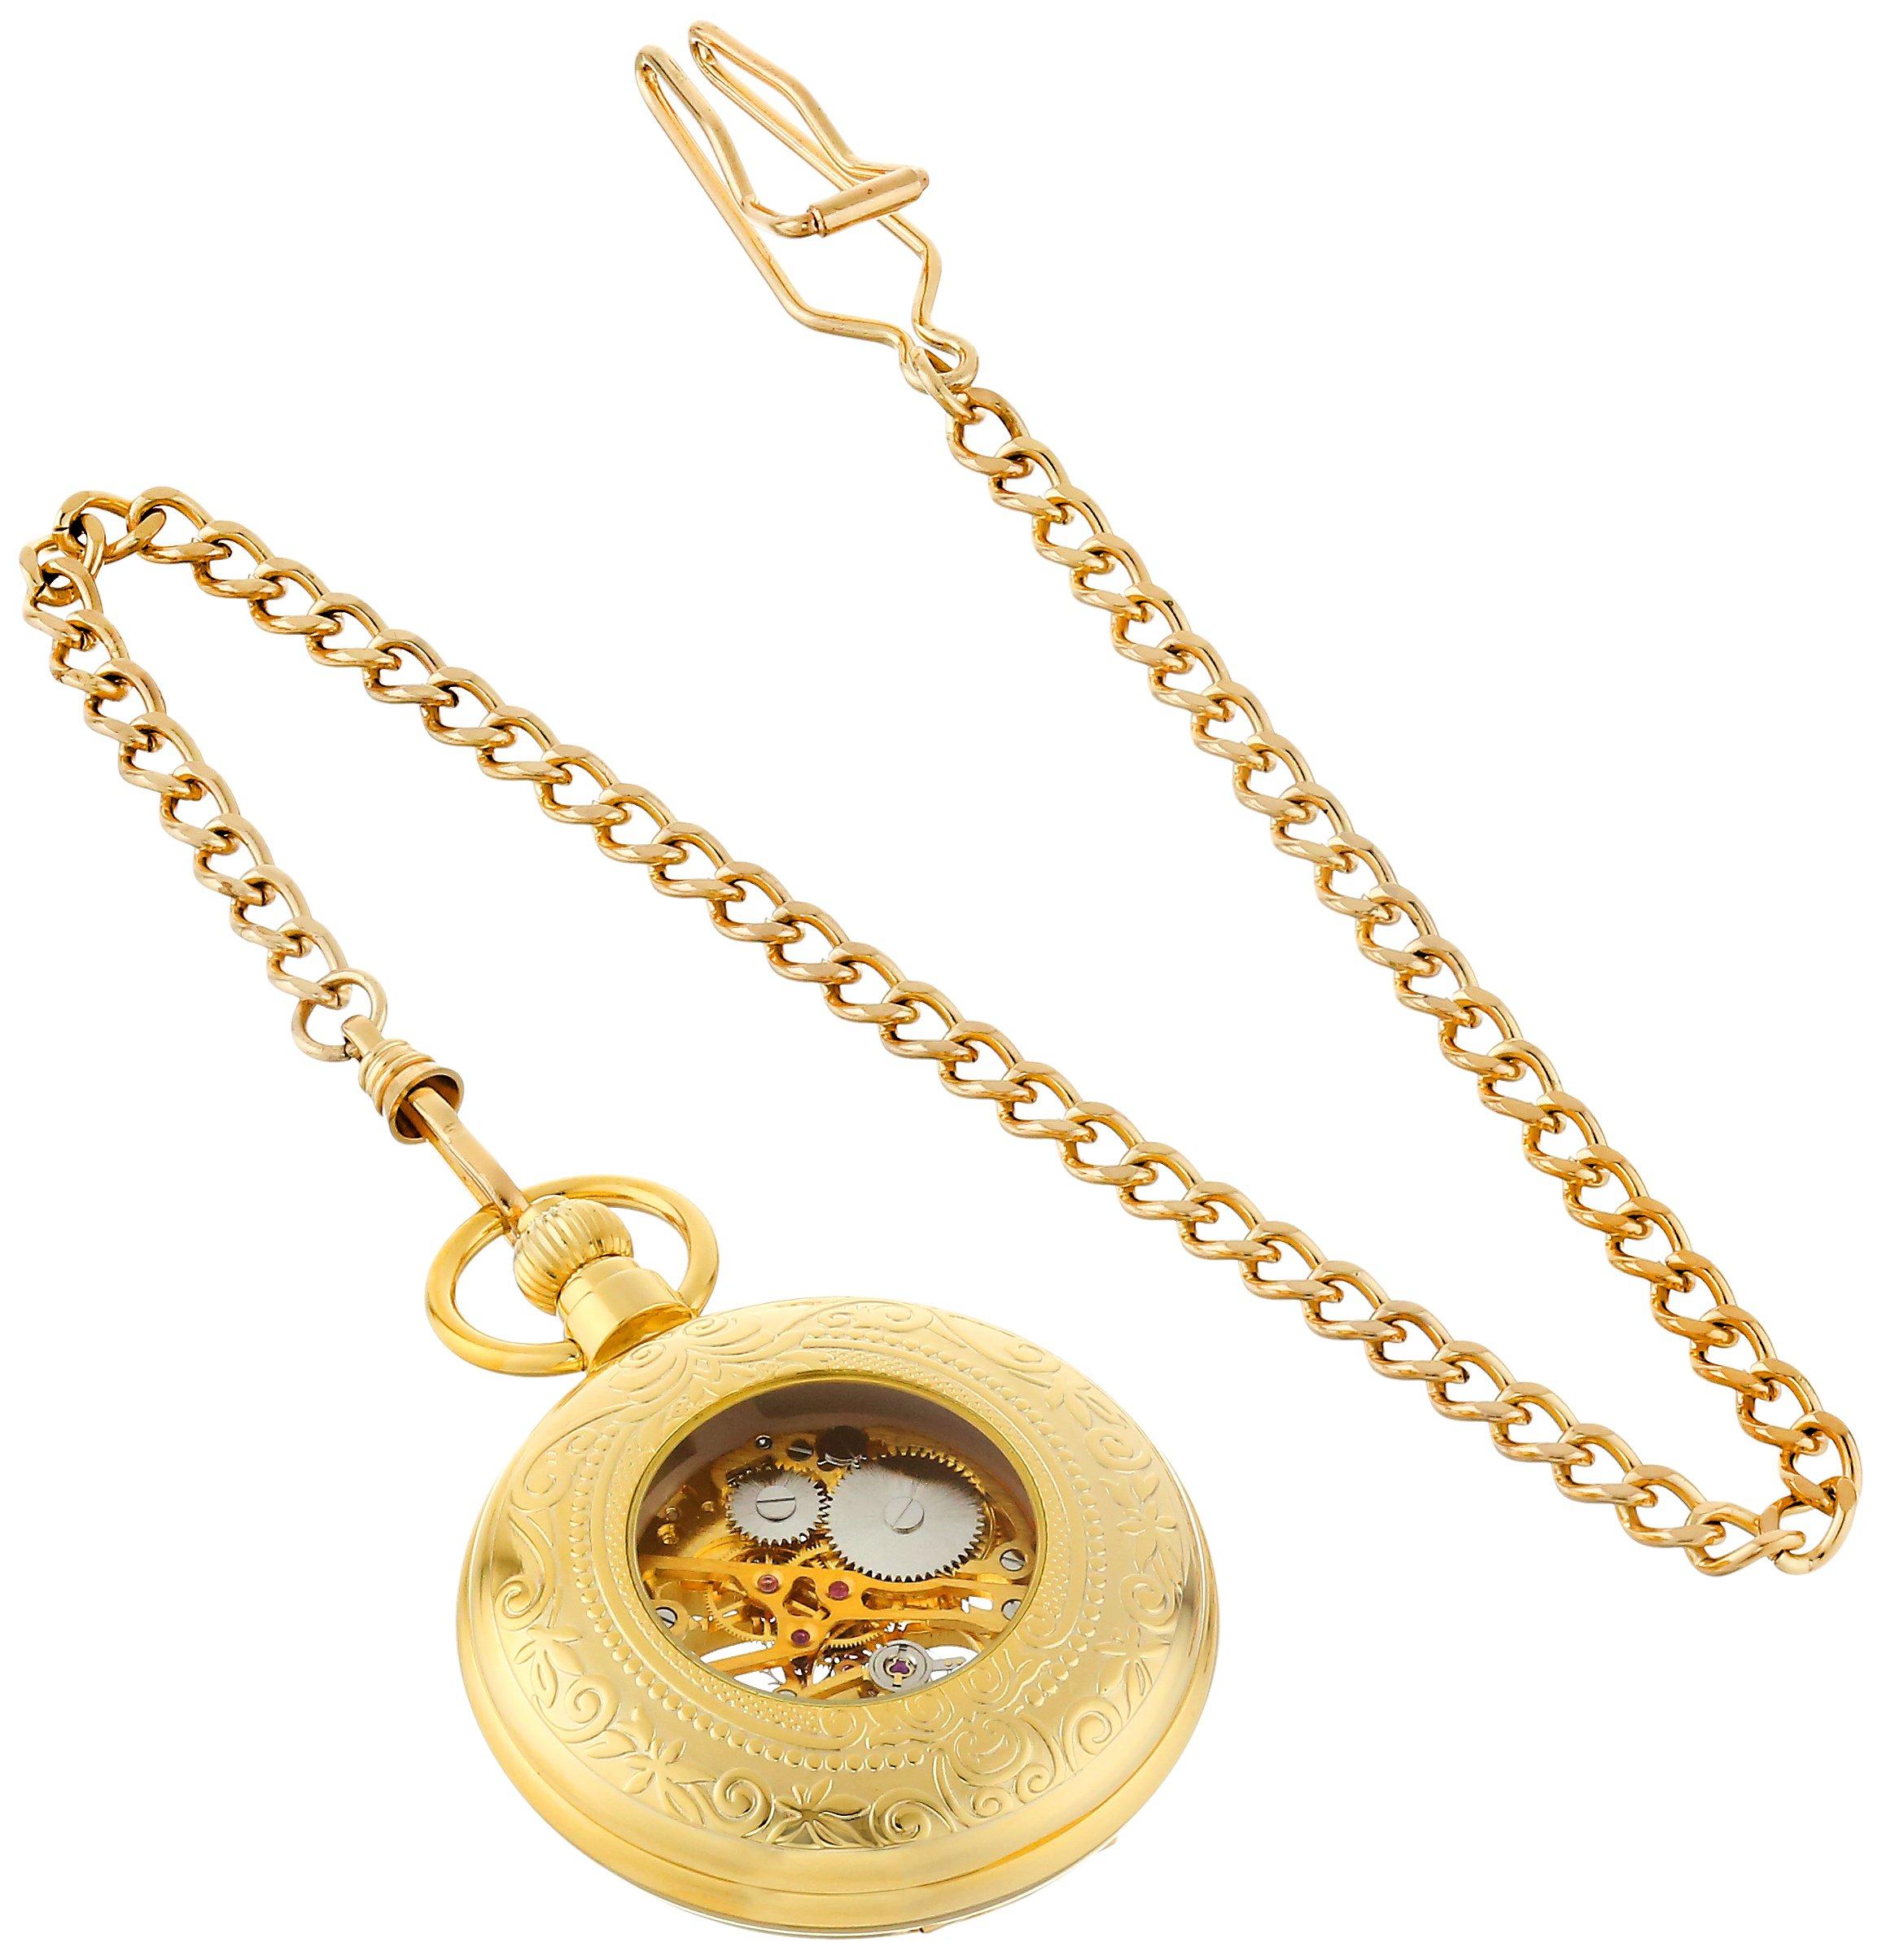 Charles-Hubert, Paris Gold-Plated Mechanical Pocket Watch by CHARLES-HUBERT PARIS (Image #2)